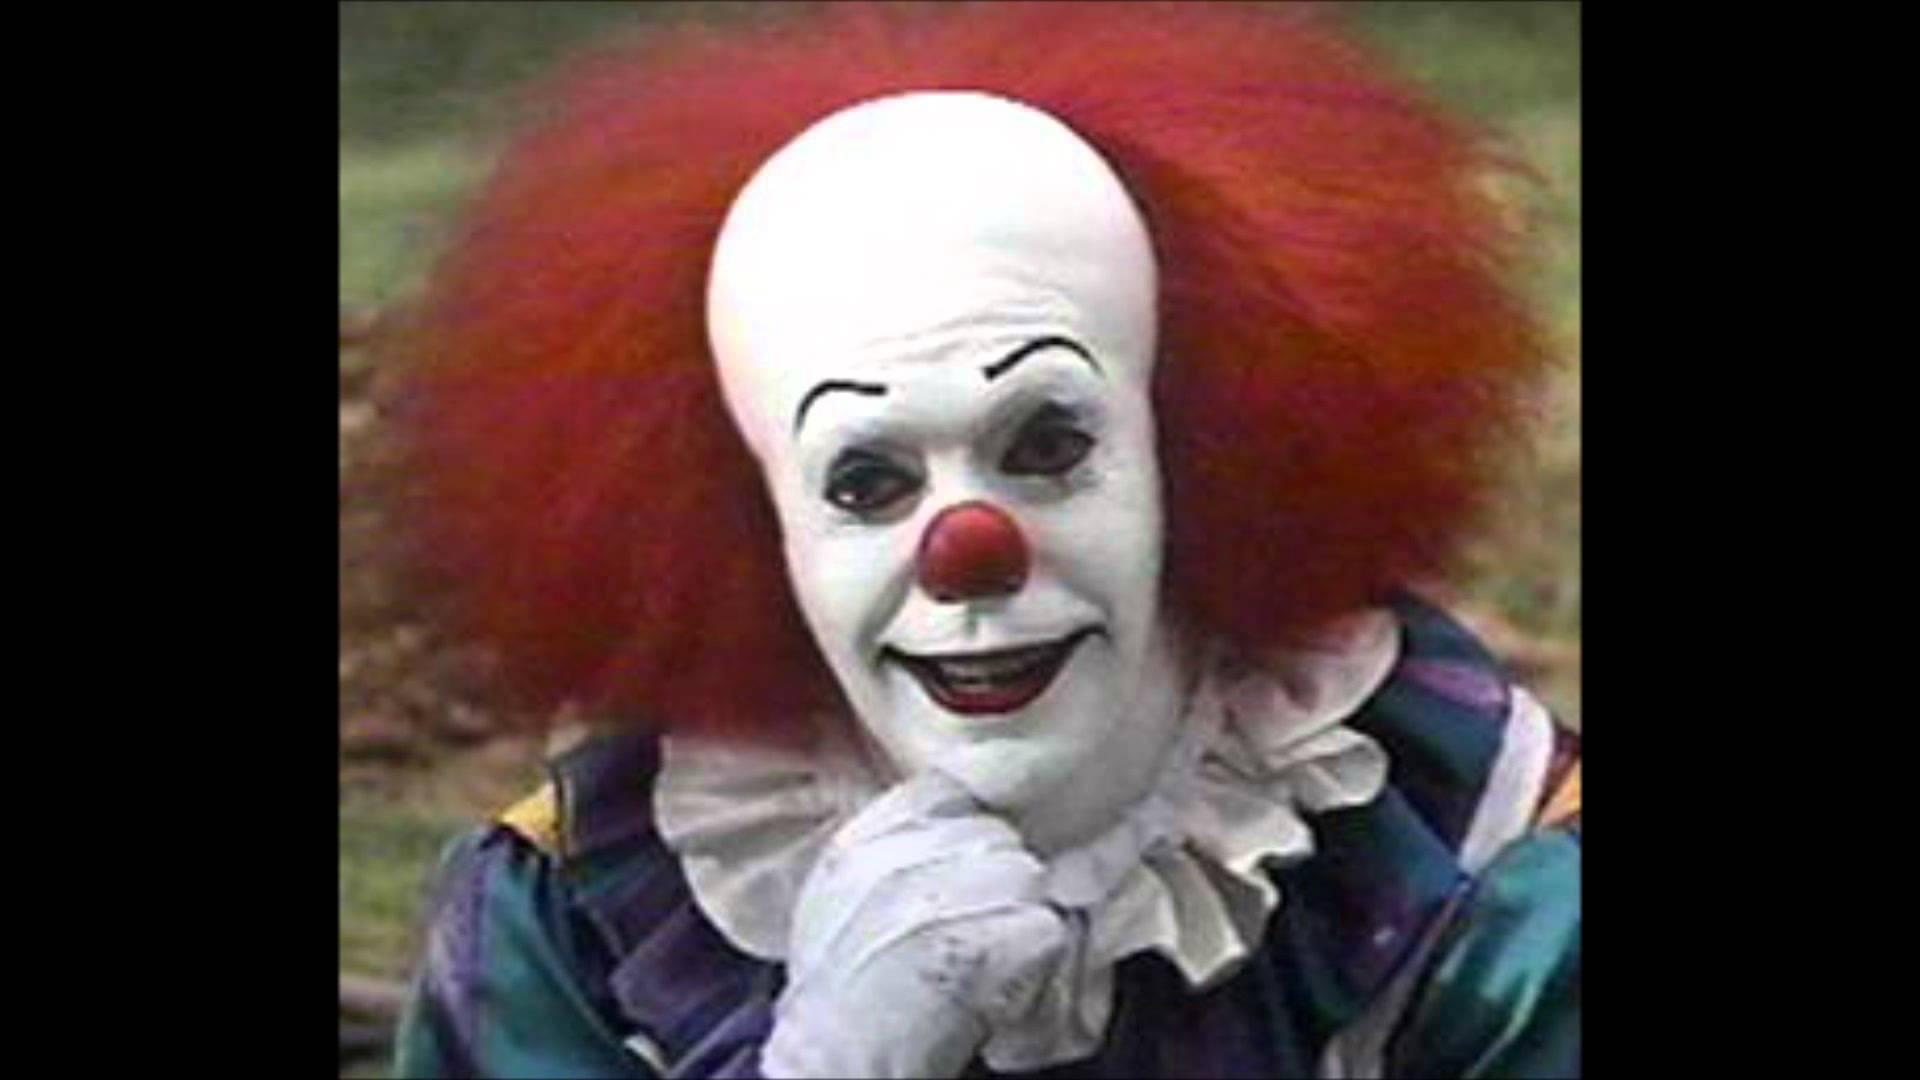 Pennywise the Clown Wallpaper - WallpaperSafari